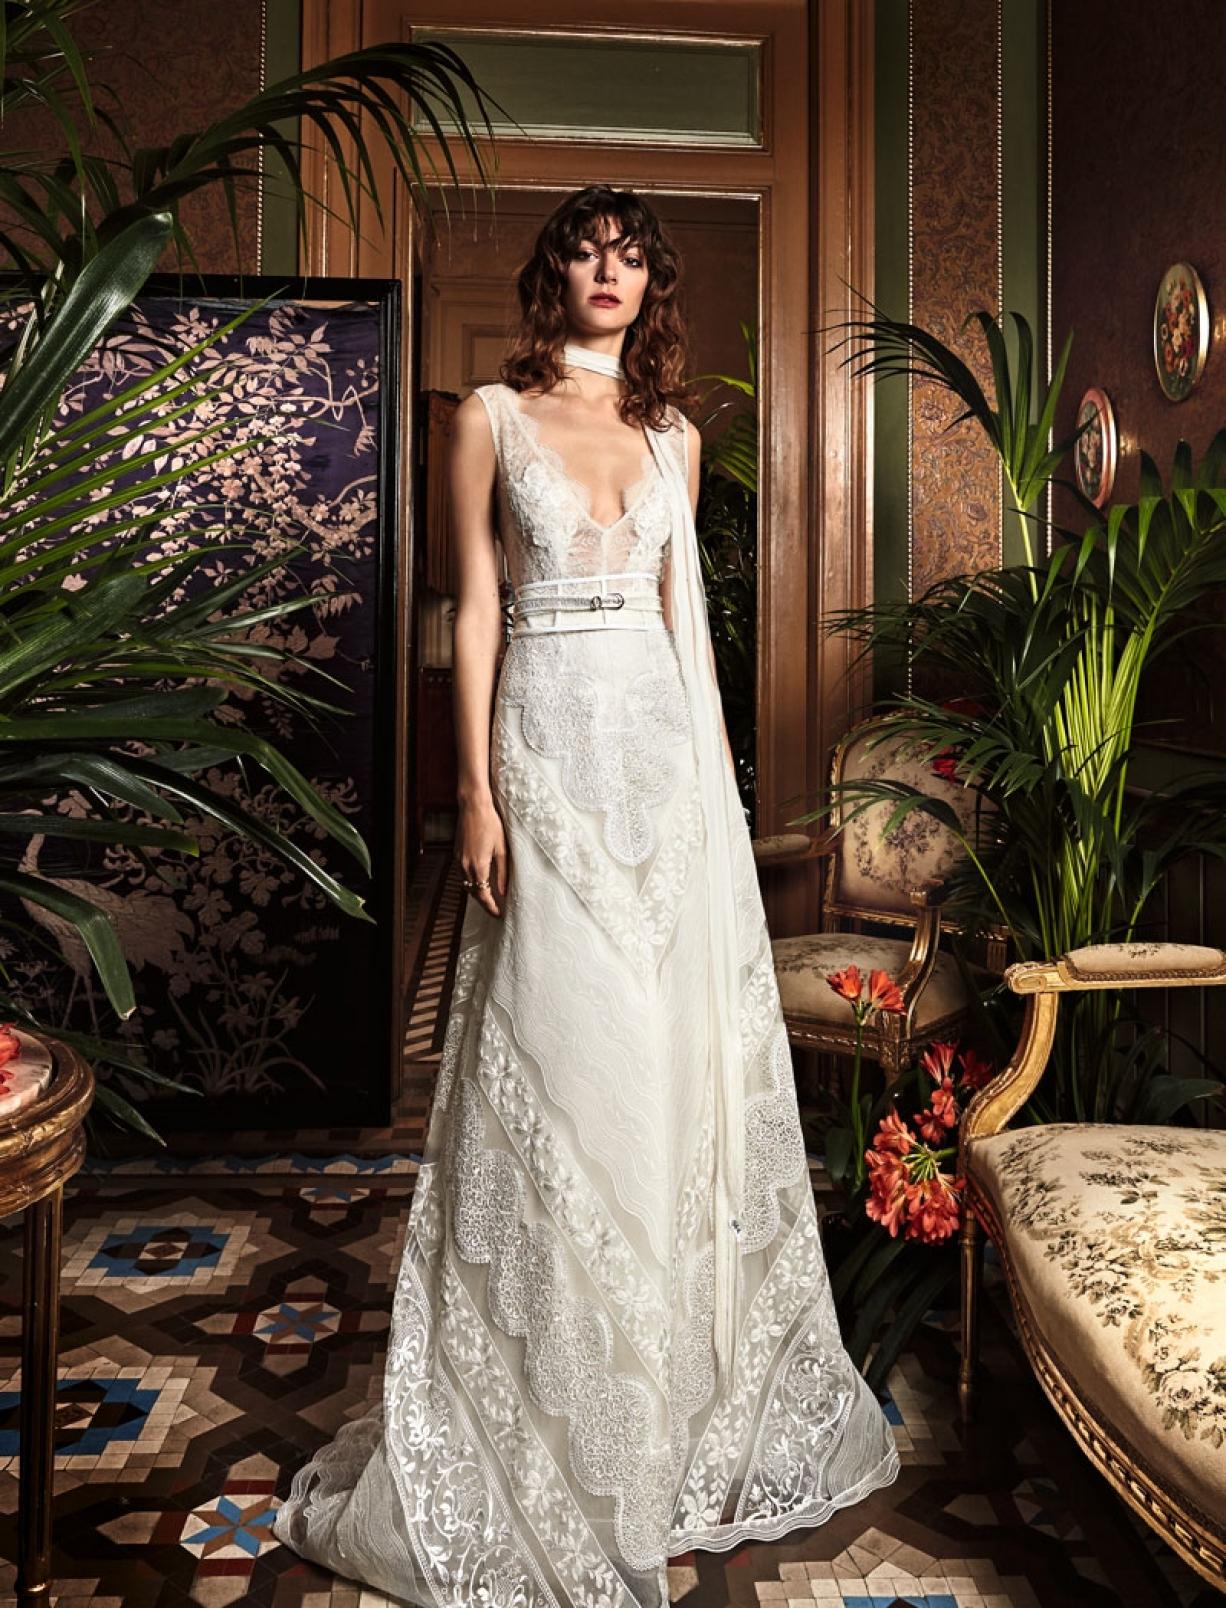 boho_chic_wedding_dresses_2017_bohemian_lace_wedding_dress_yolan_cris_chris_style_trebol.jpg